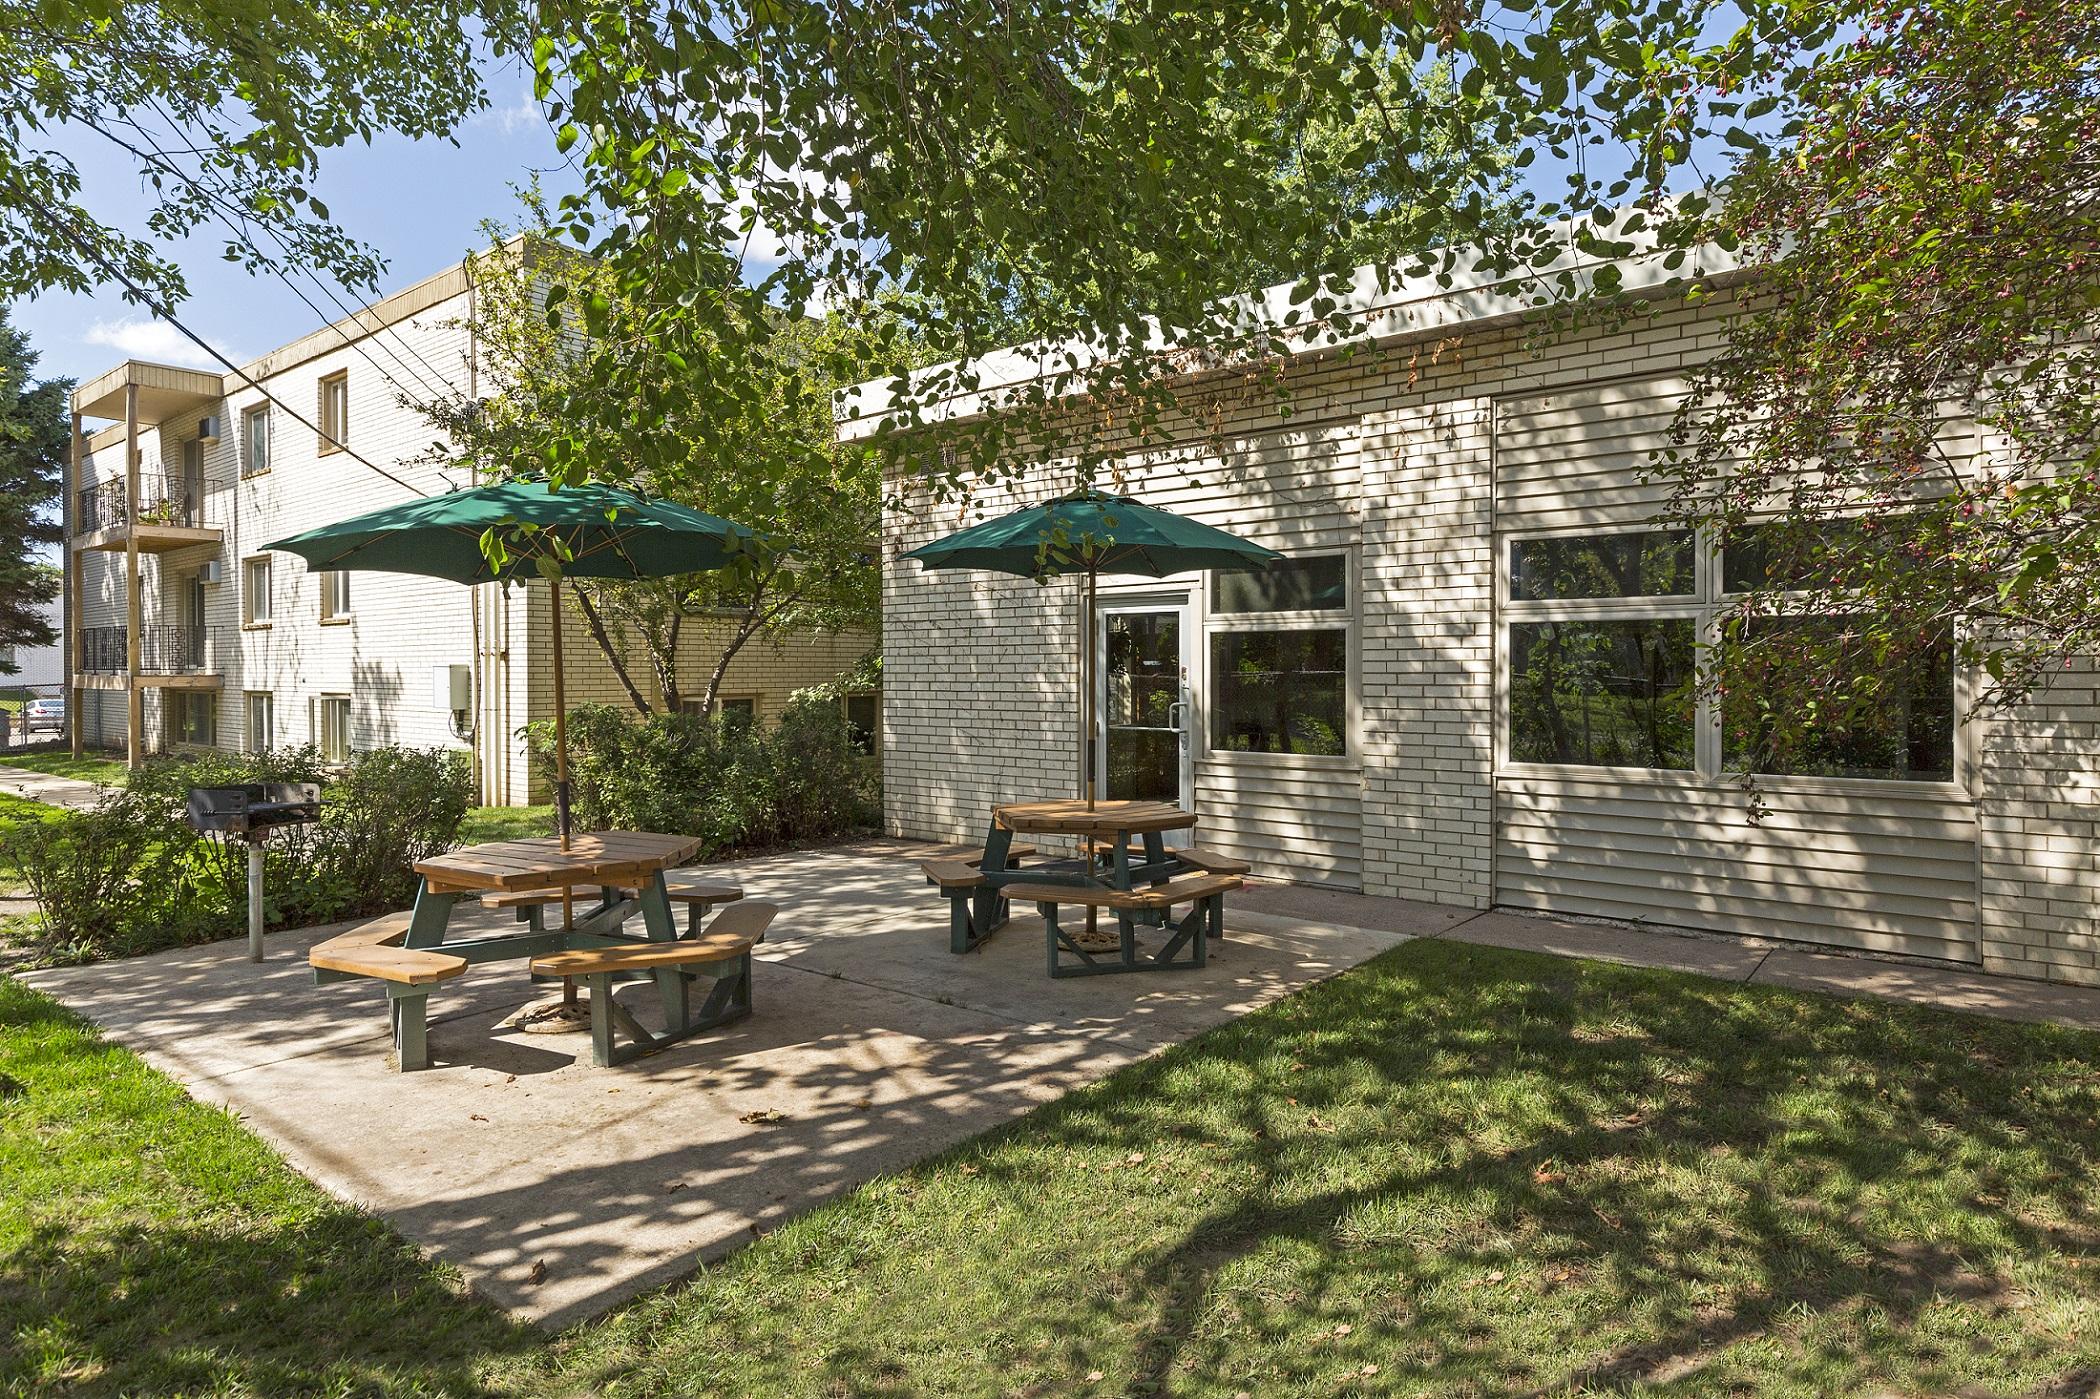 Hamline Terrace - Bigos Management develops rental communities that meet your lifestyle expectations